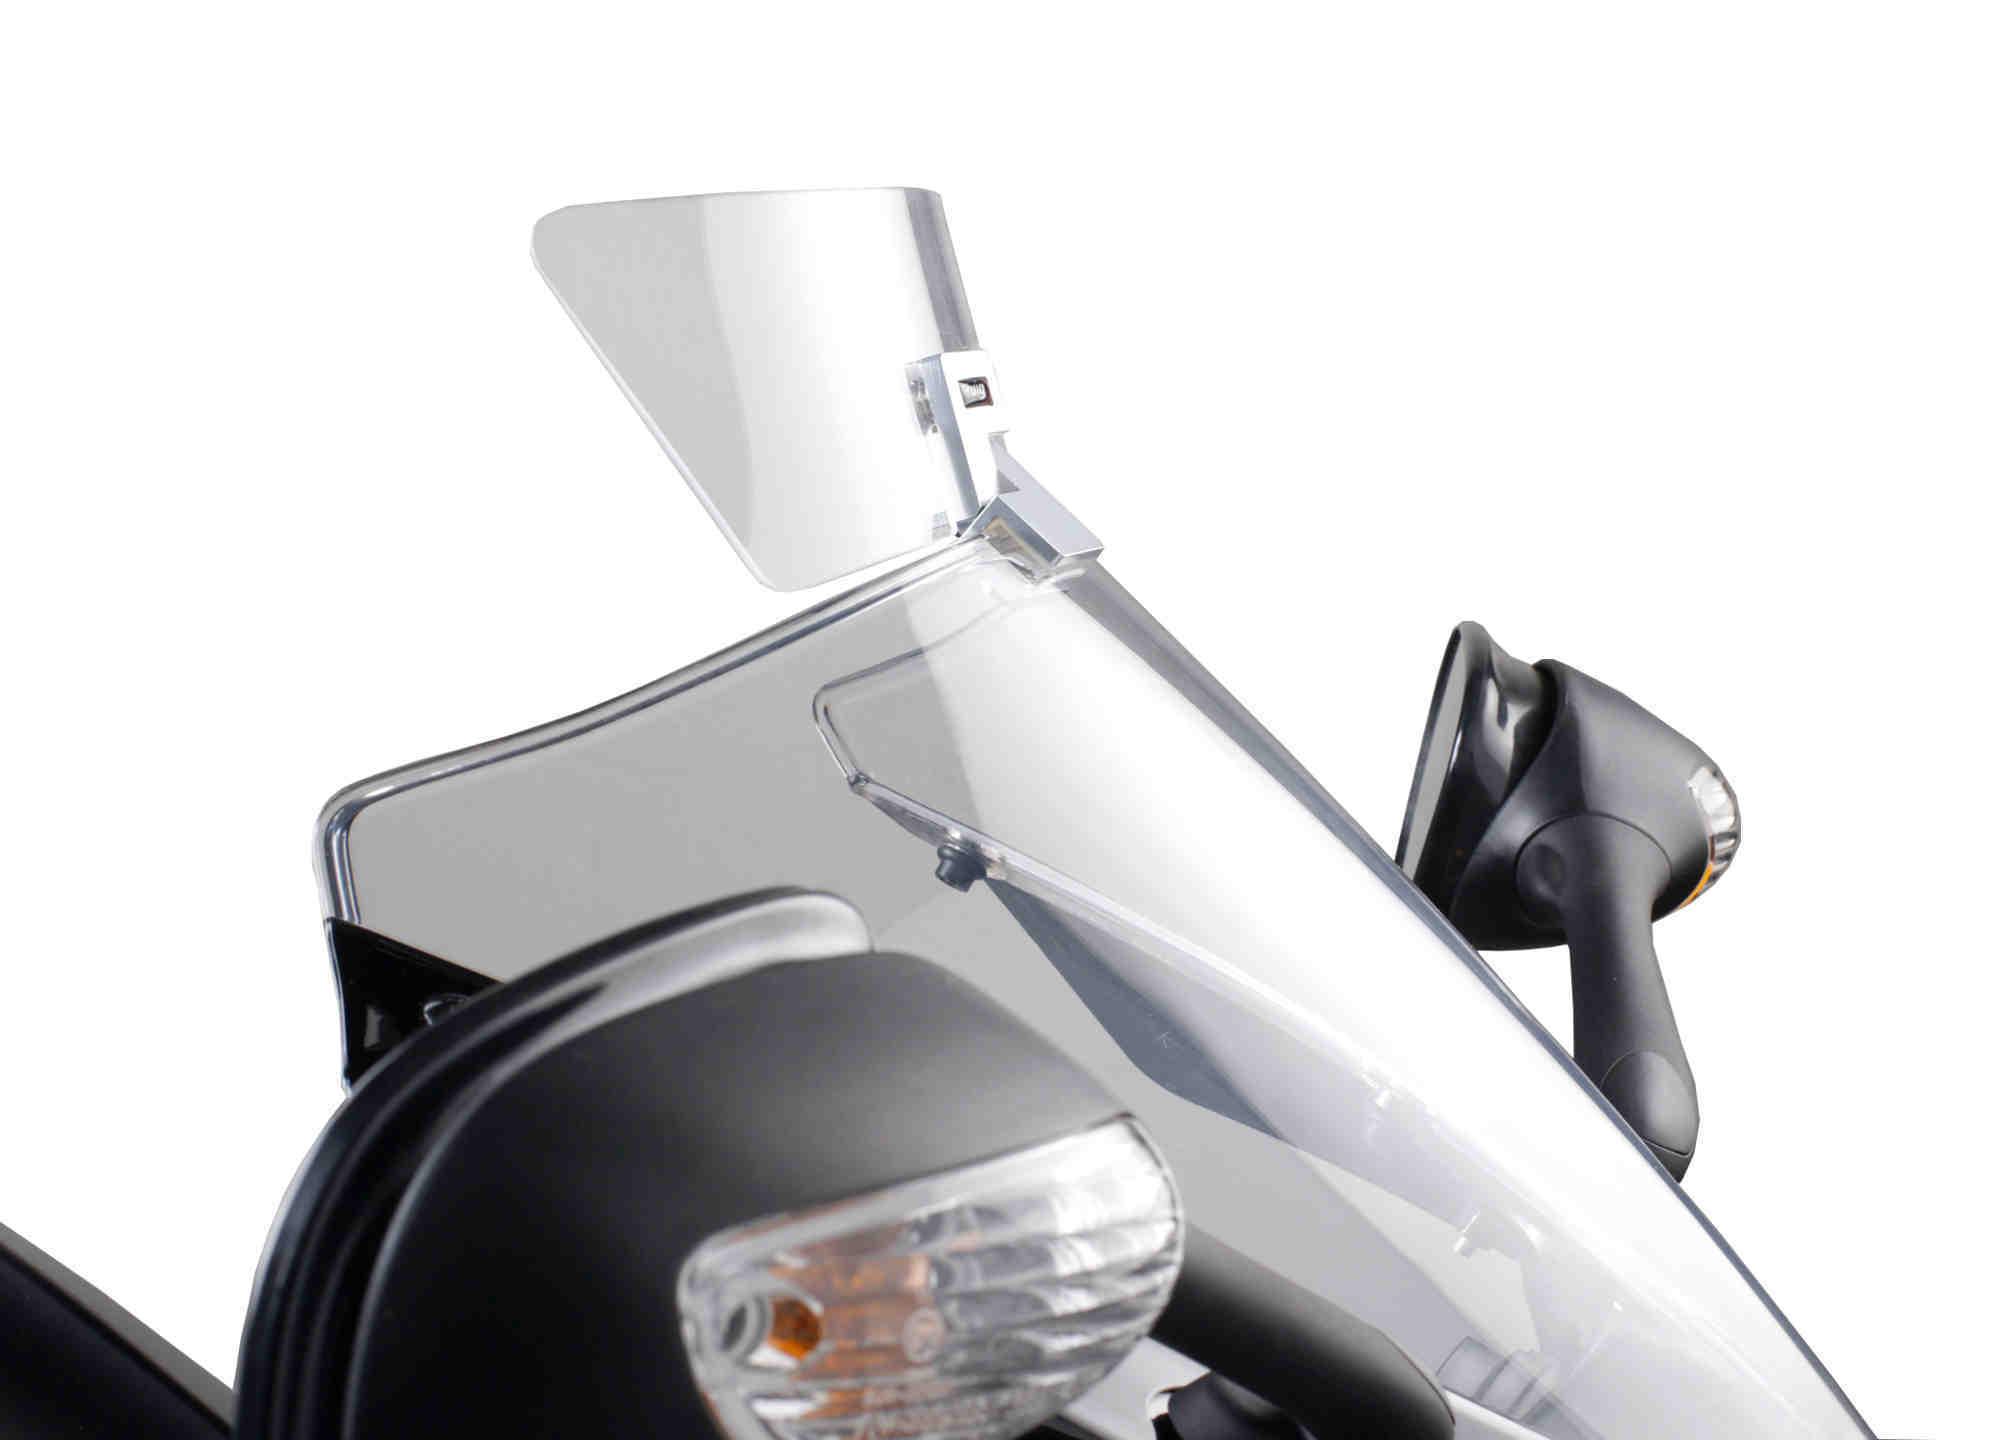 PUIG Air deflector dome added to visor, radius 125mm (very curve) TRANSPARENT AP